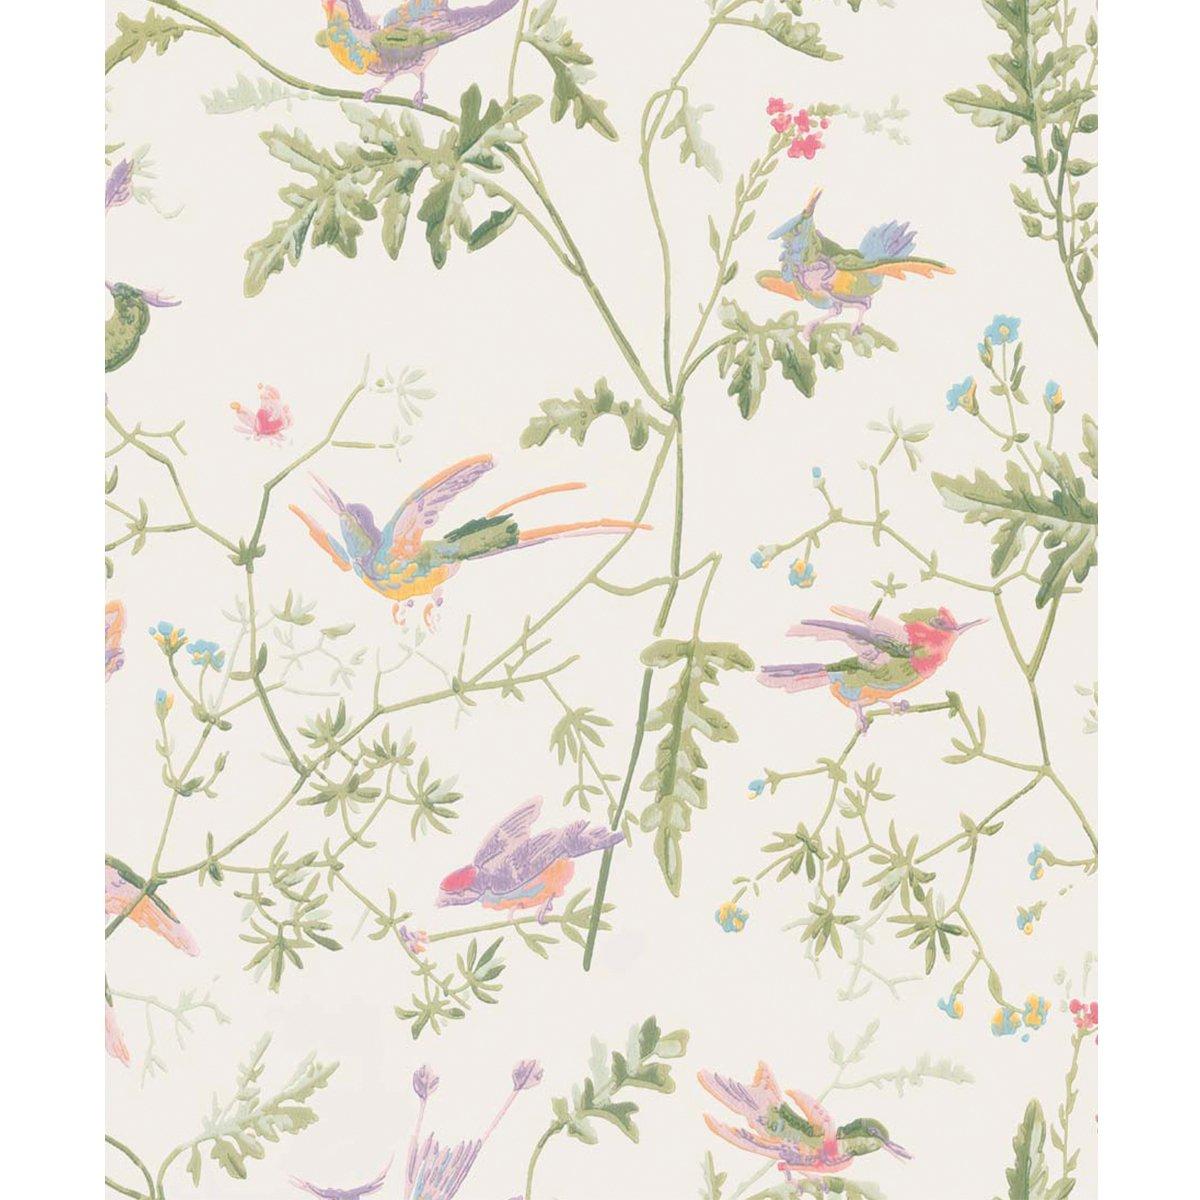 Cole & Son Hummingbirds Behang - 10014067